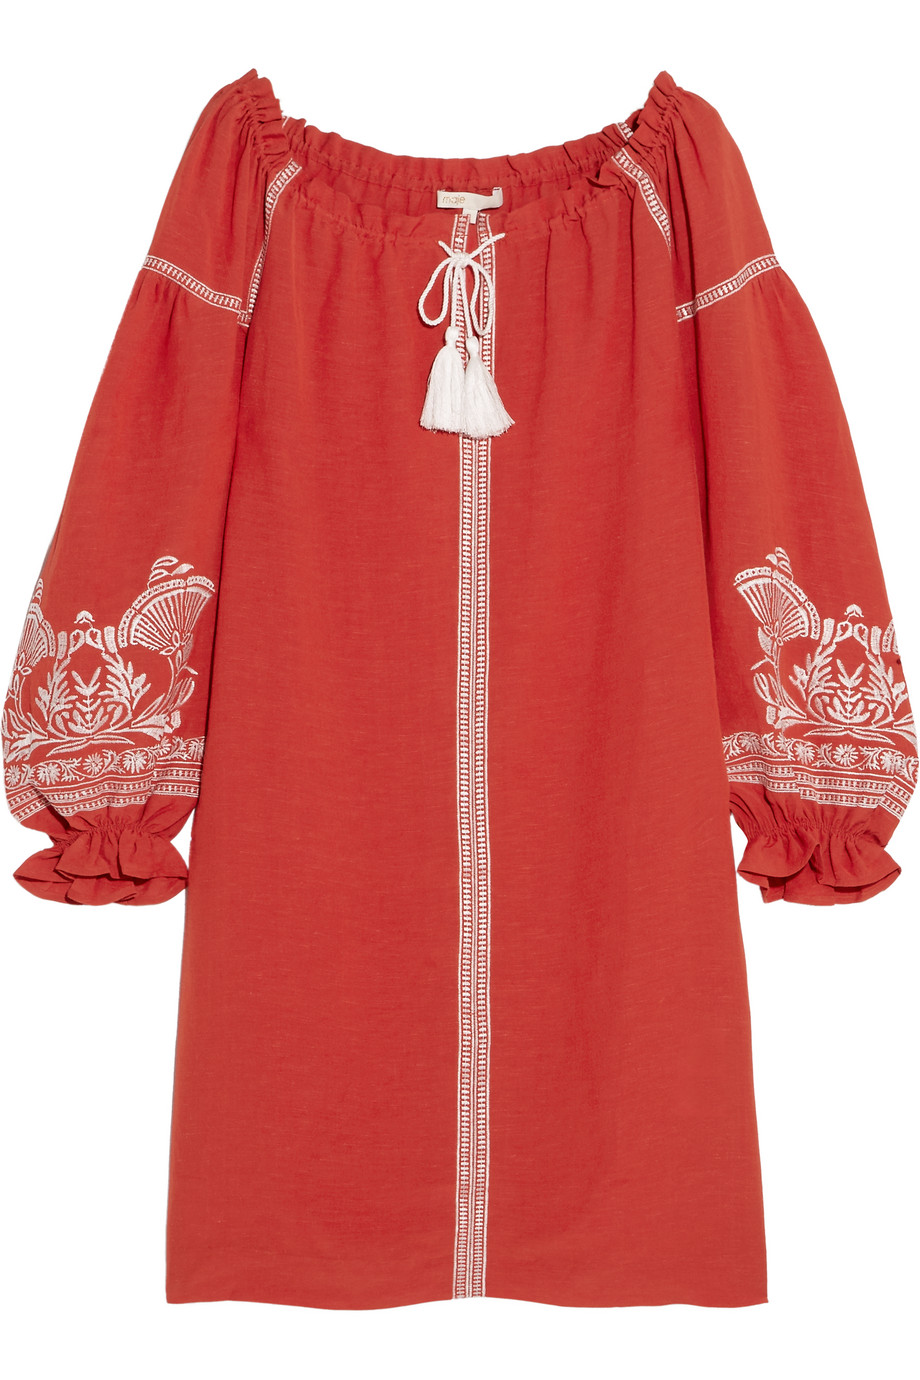 Maje Embroidered Slub Crepe Mini Dress, Red, Women's - Embroidered, Size: 3